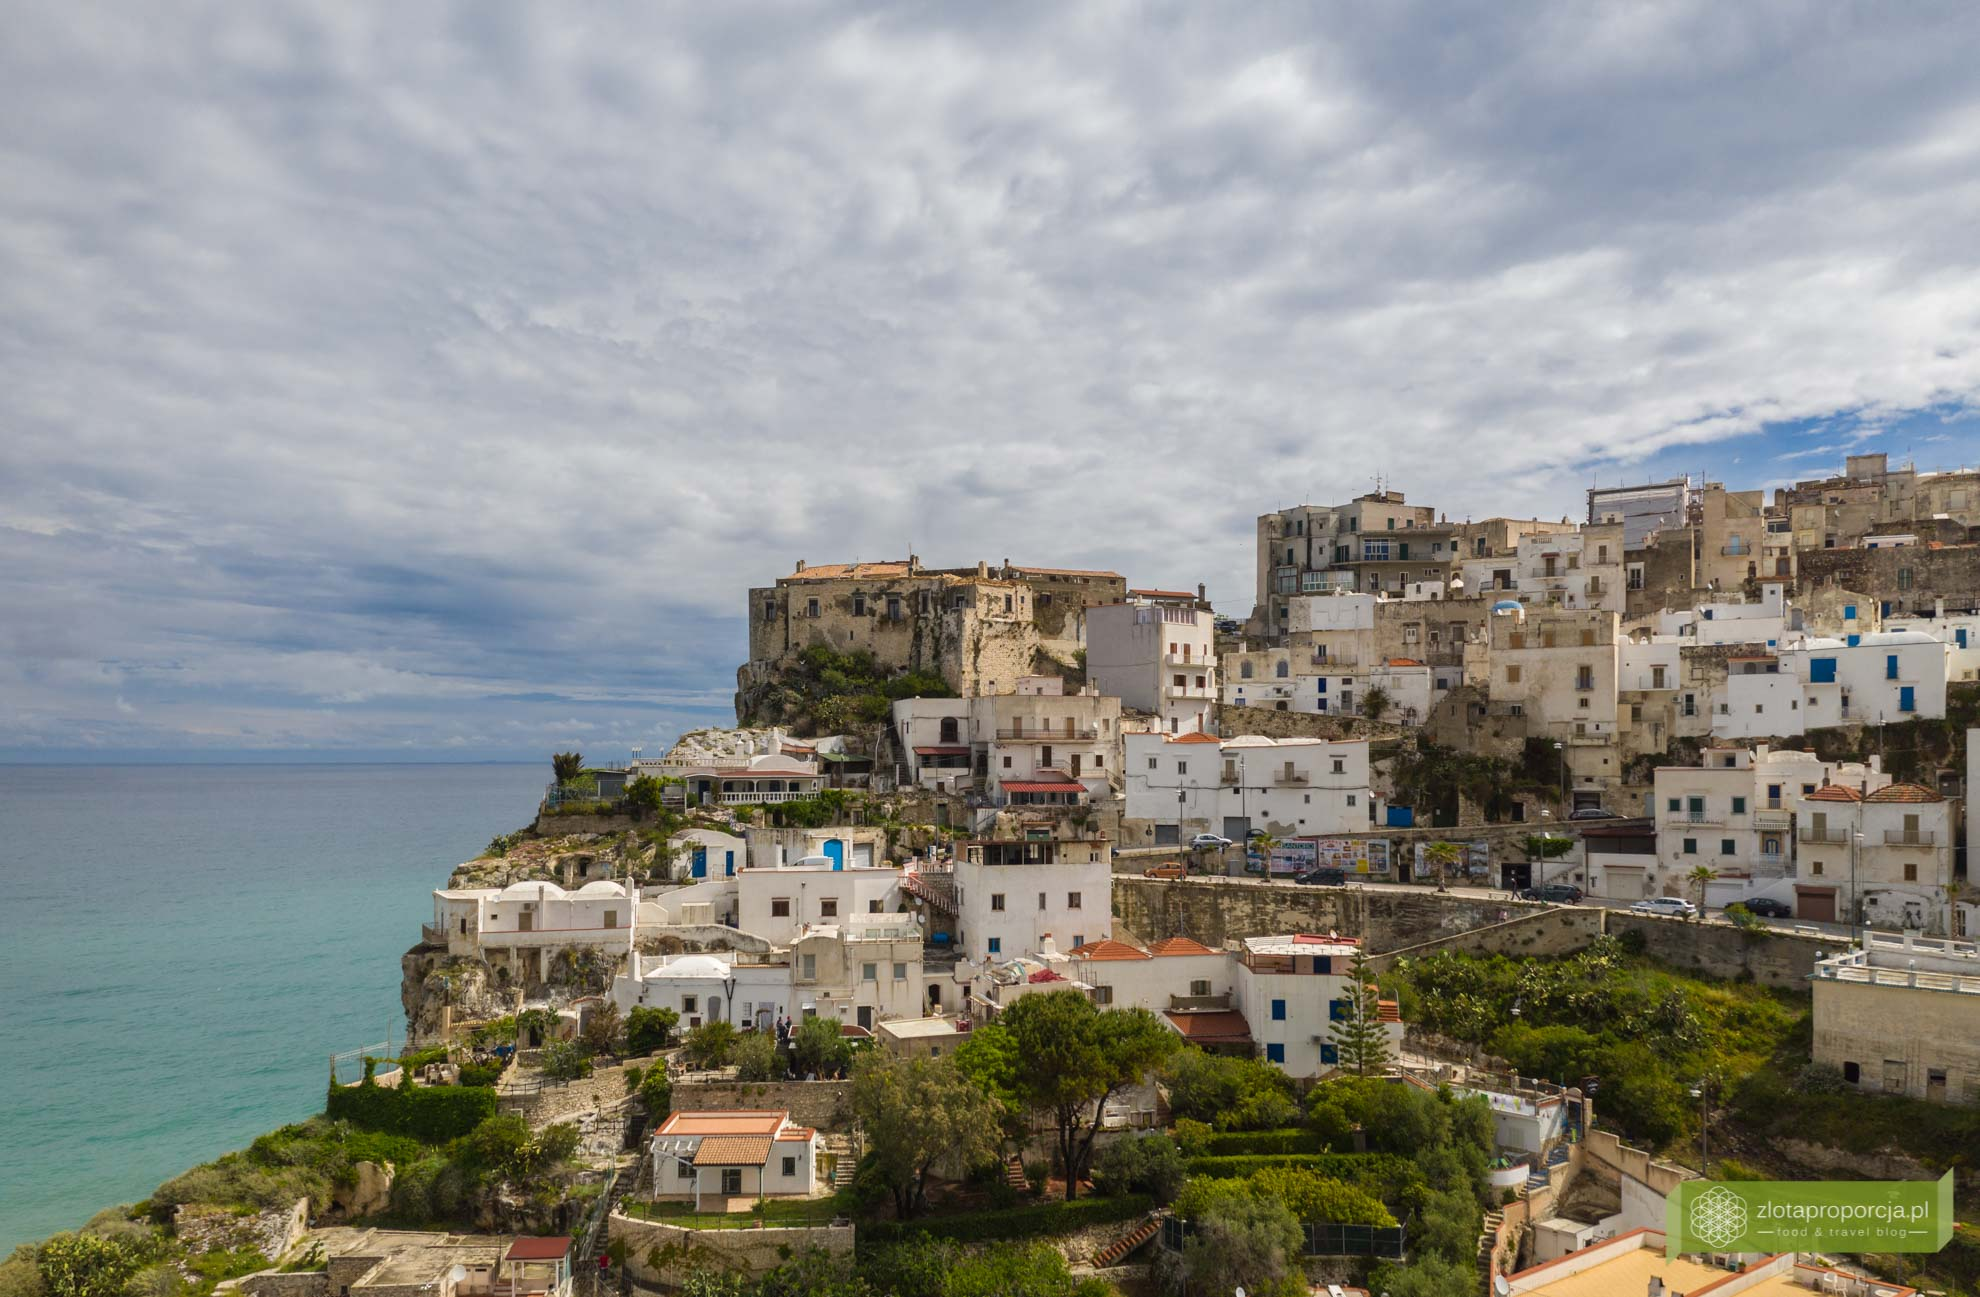 Gargano; Apulia; atrakcje Gargano; co zobaczyć na Gargano; atrakcje Apulii; Peschici;